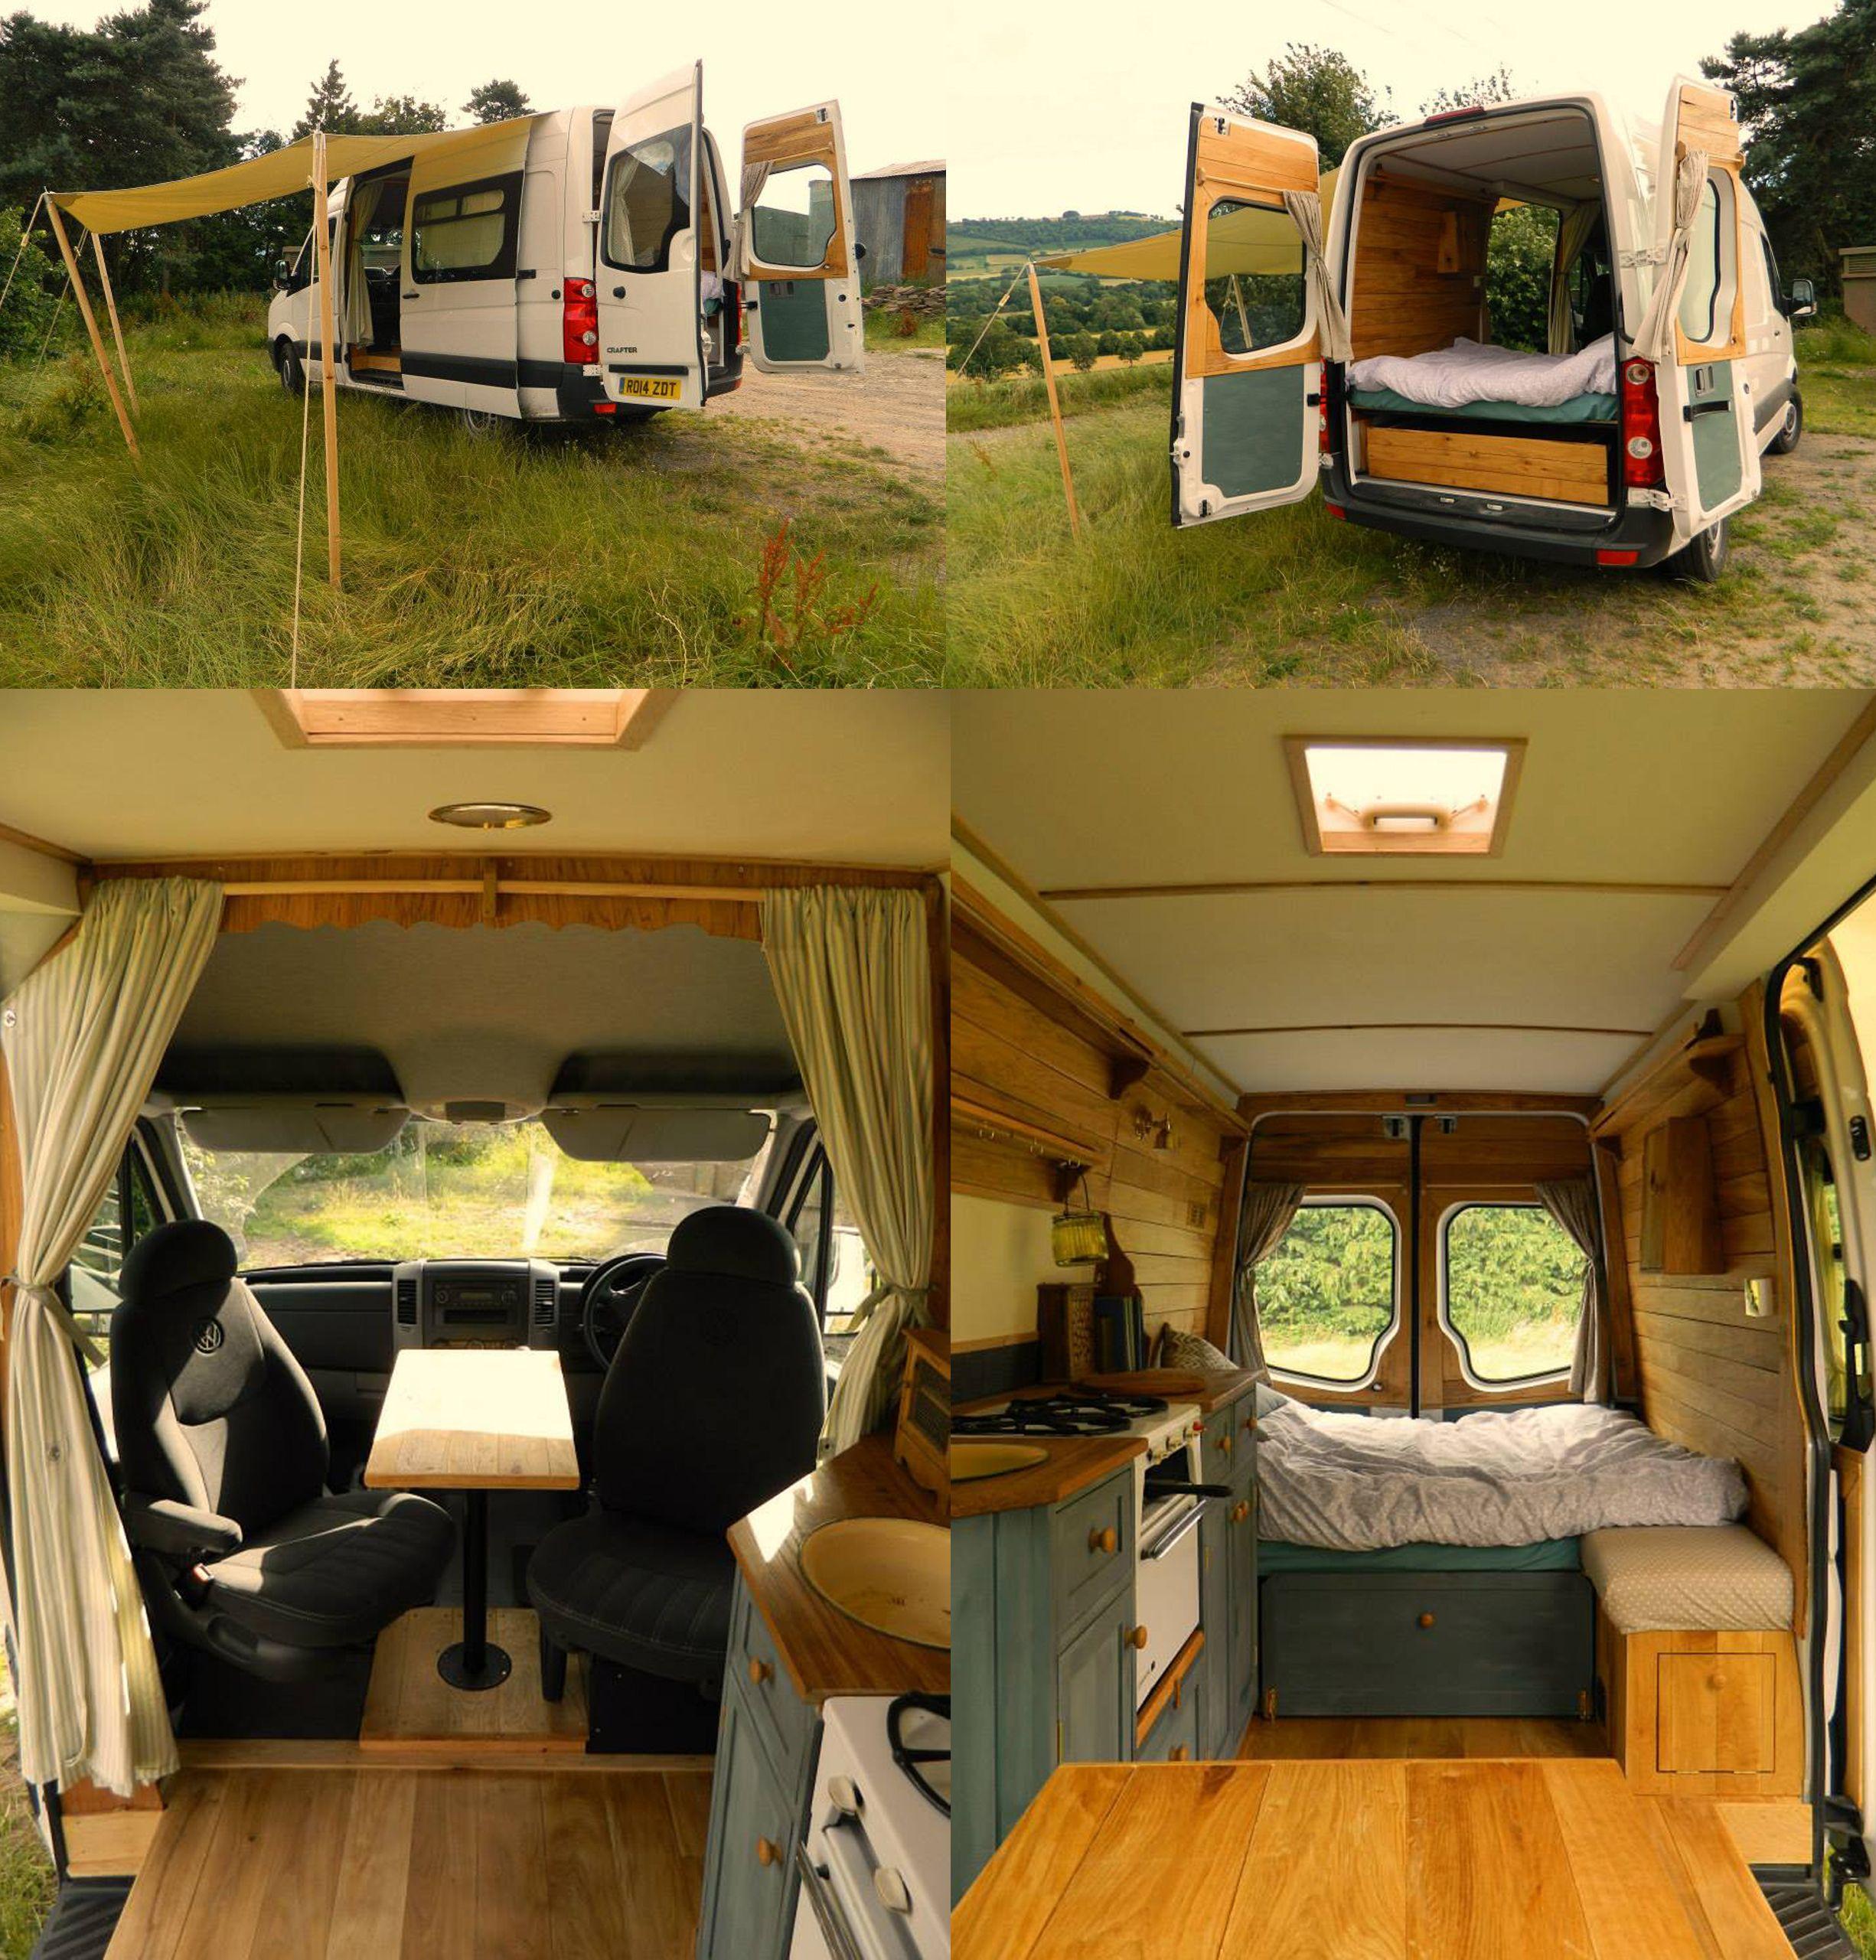 vw crafter camper transformation by rustic campers great. Black Bedroom Furniture Sets. Home Design Ideas